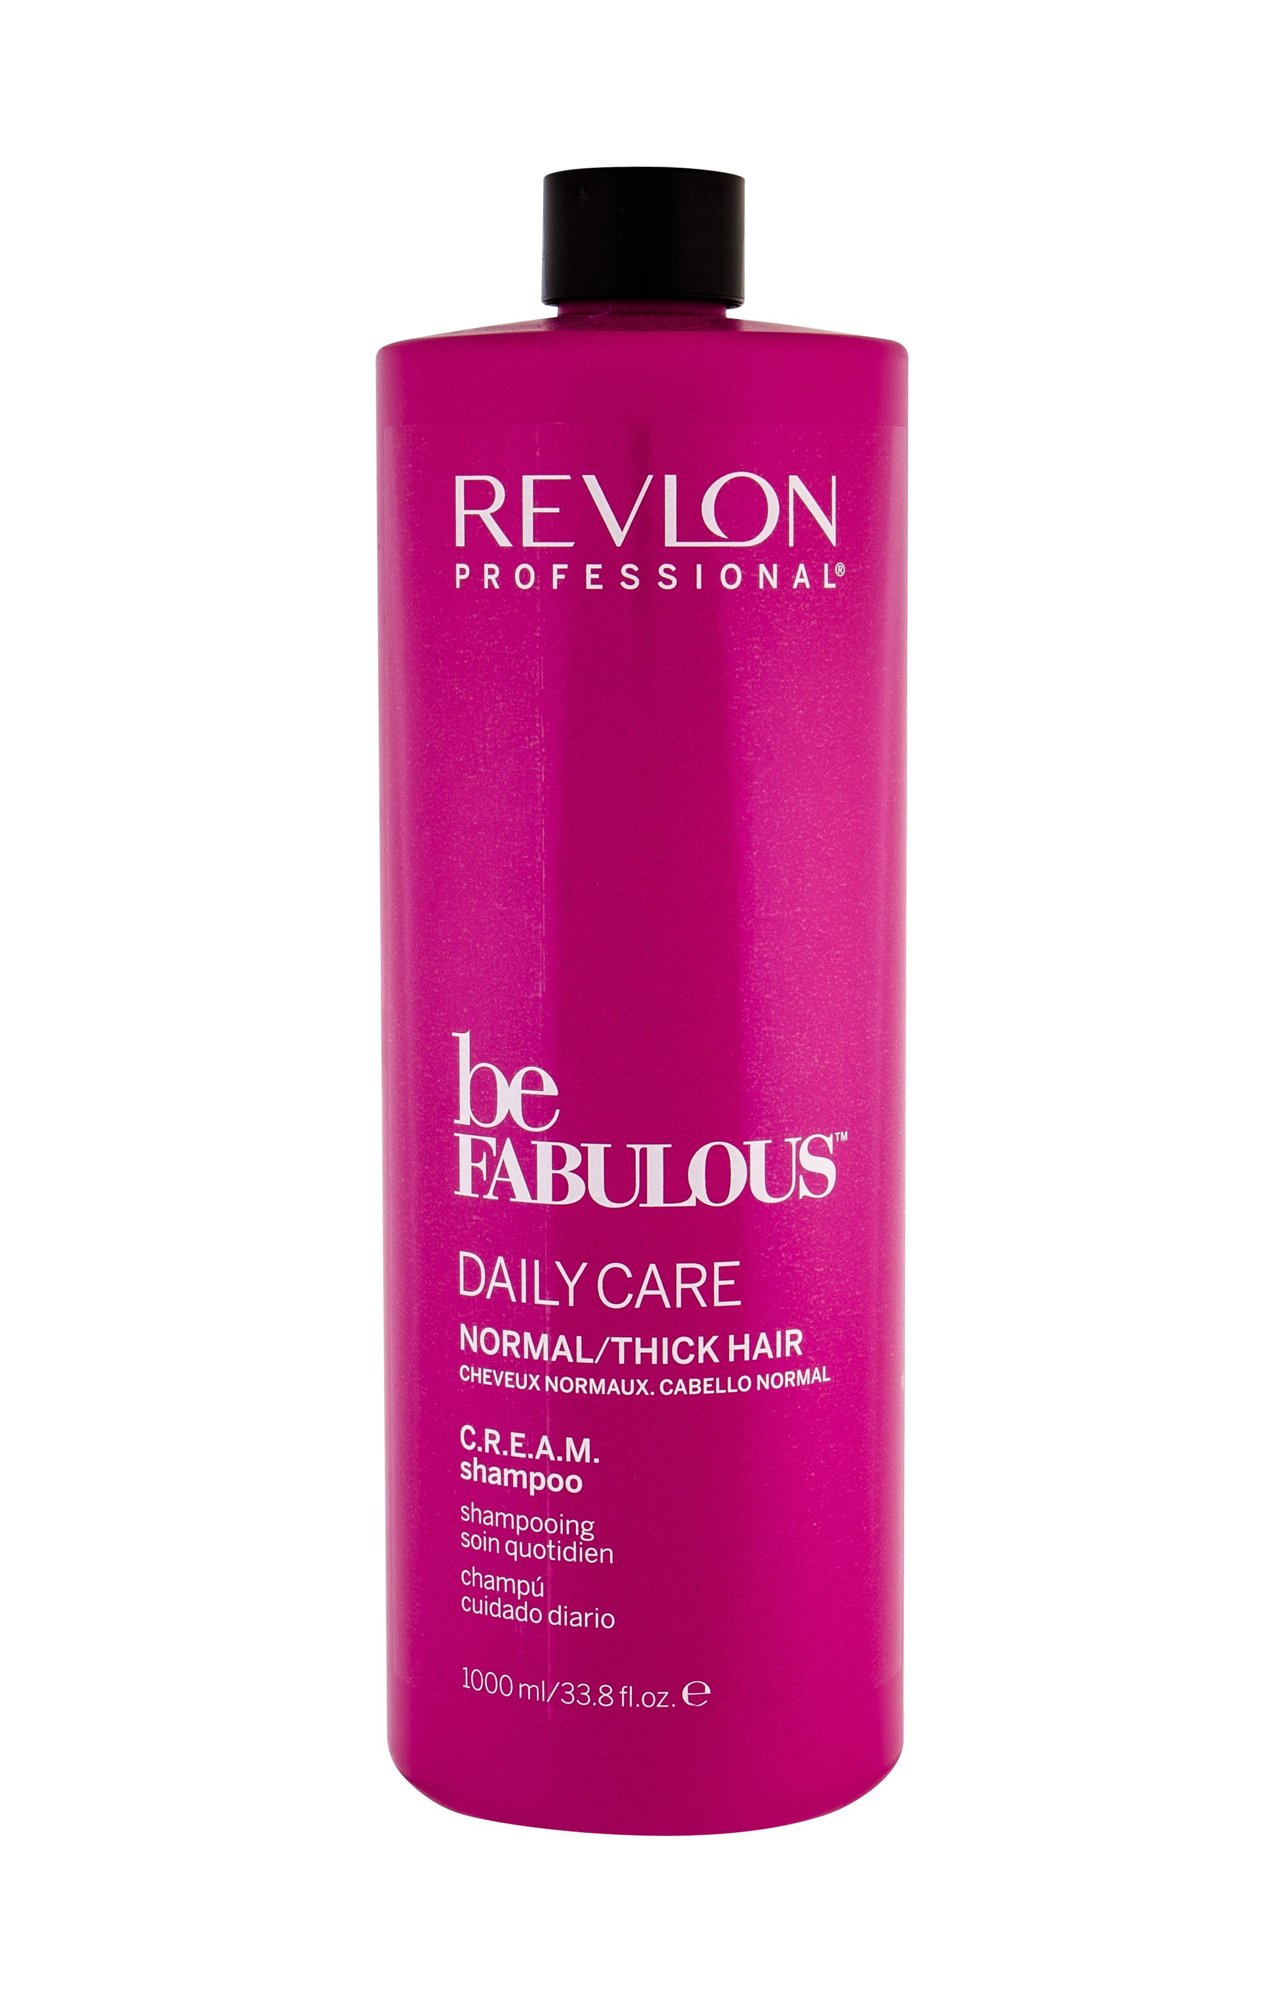 Revlon Professional Be Fabulous Shampoo 1000ml